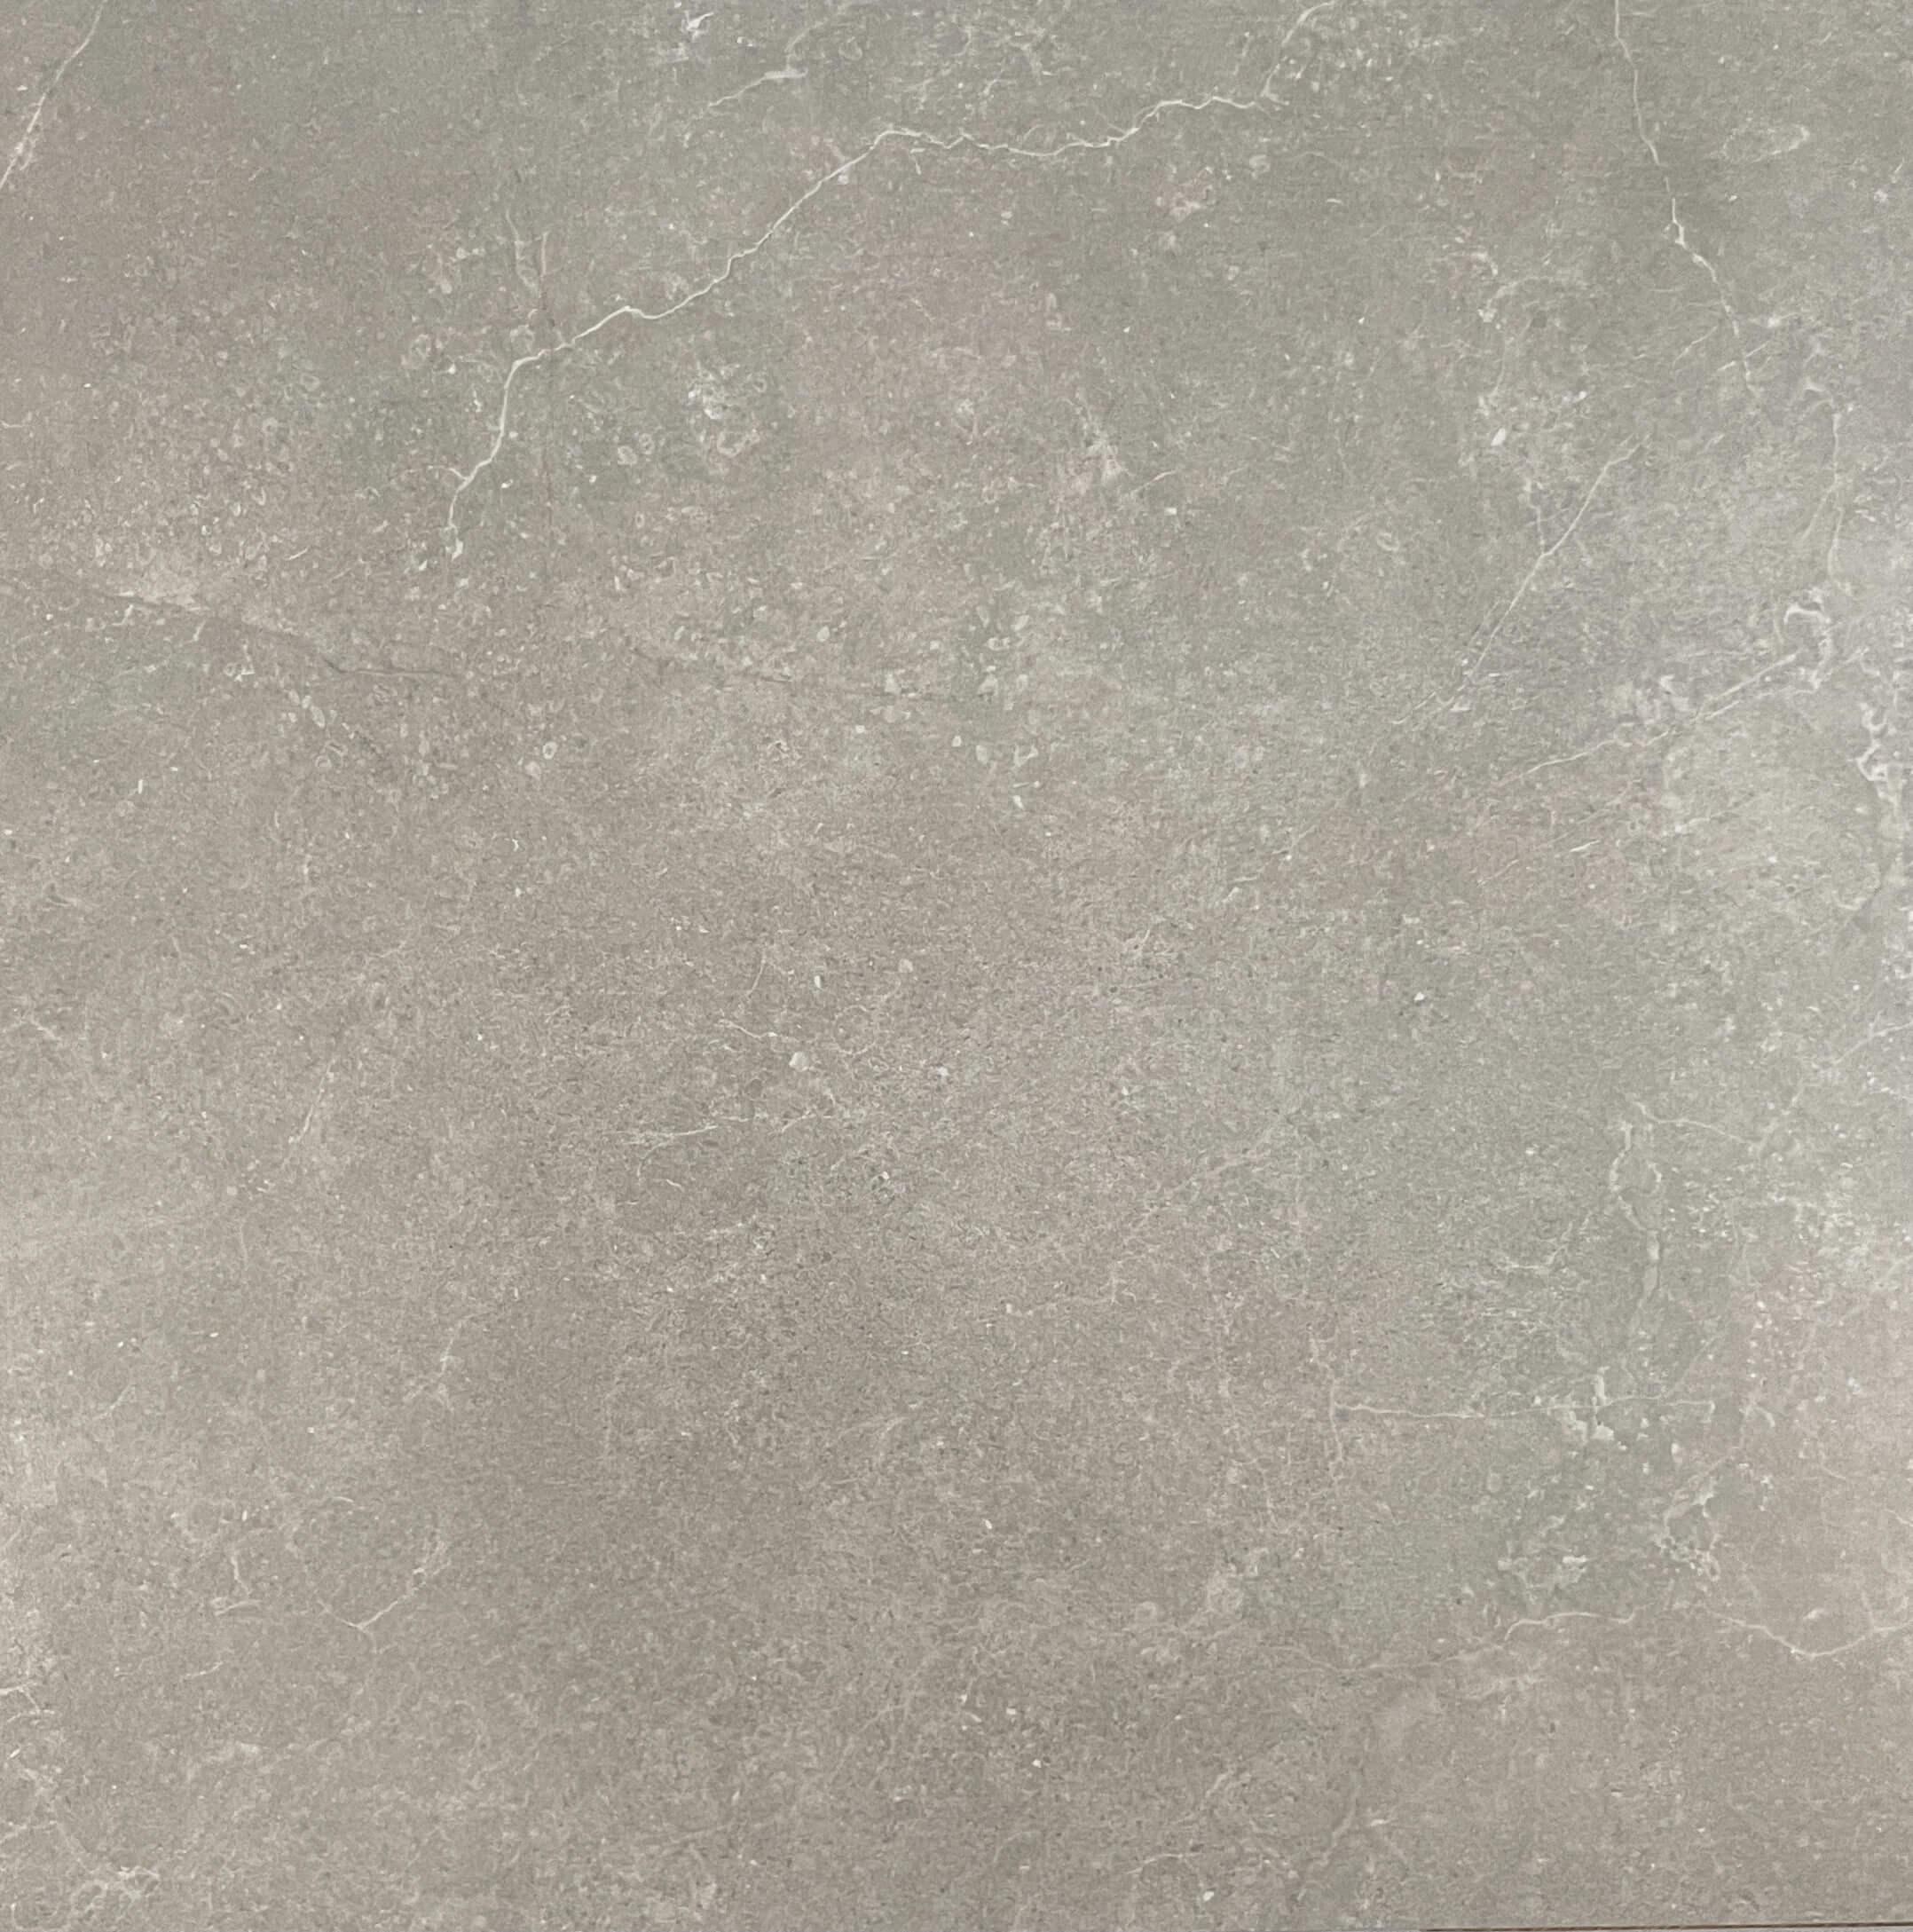 Trafalgar Silver Matt Rectified Porcelain Tile 3131